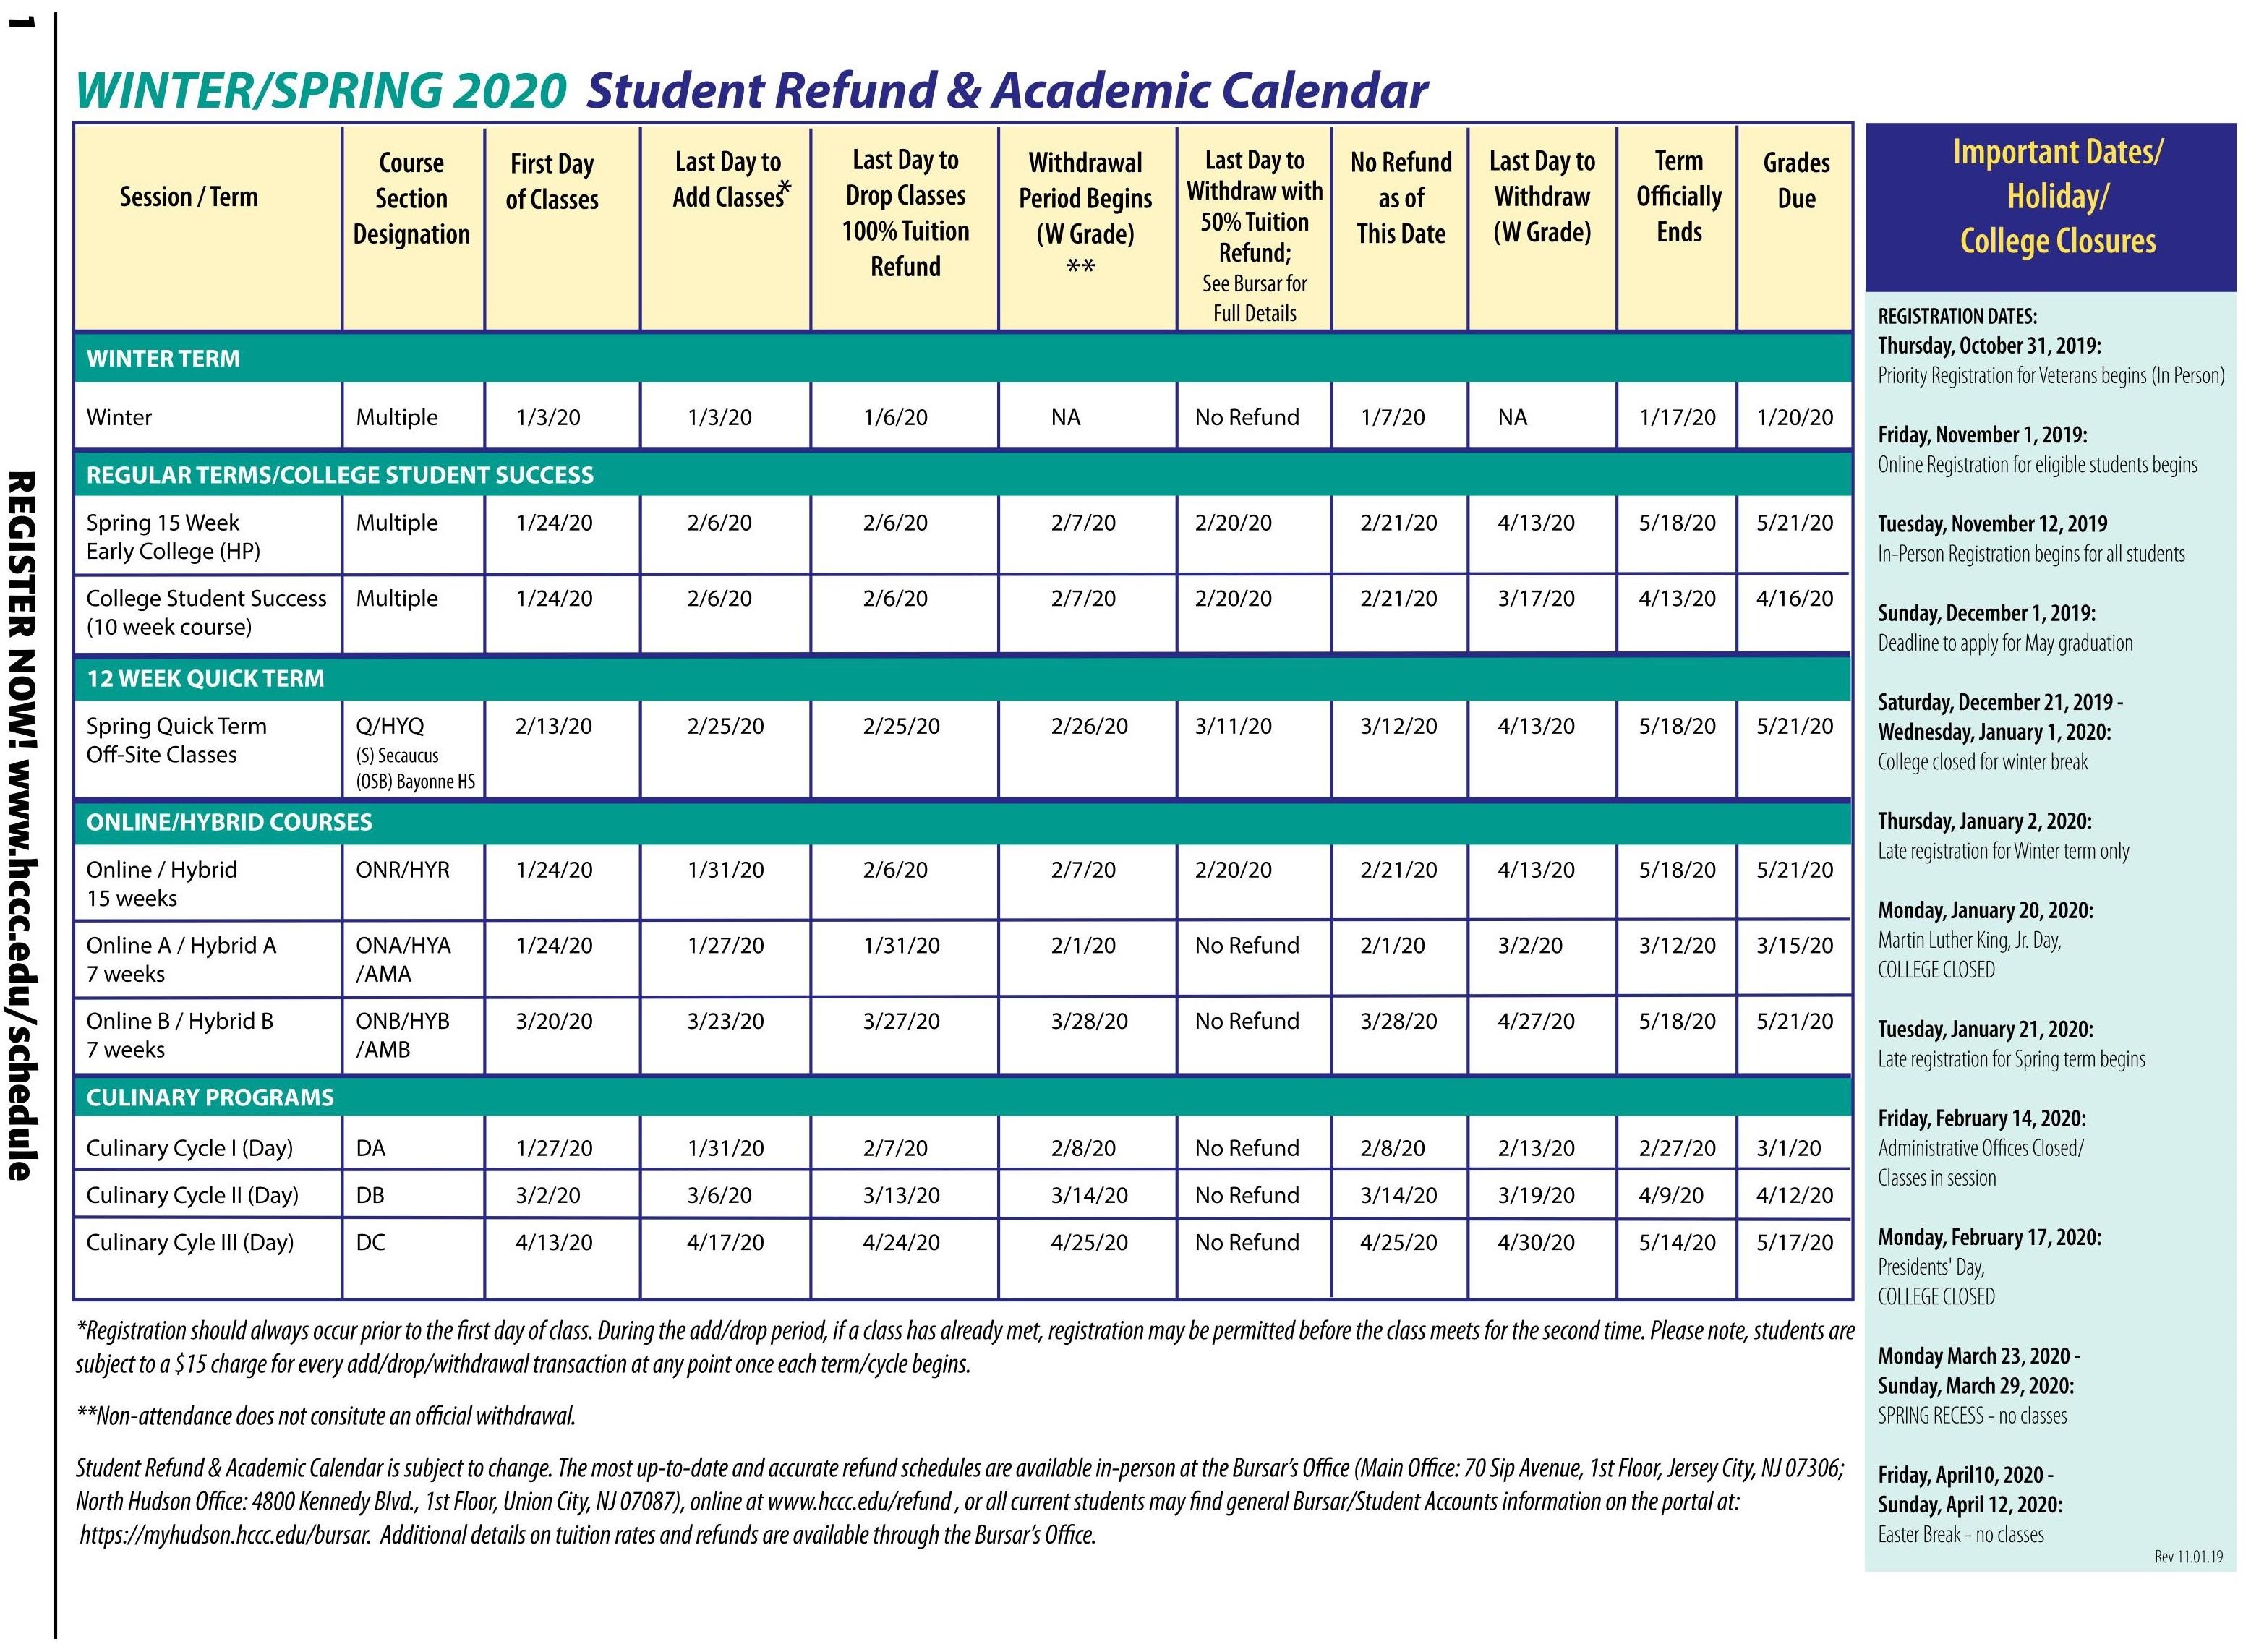 Hudson County Community College regarding Nassau Community College Spring 2020 Calendar